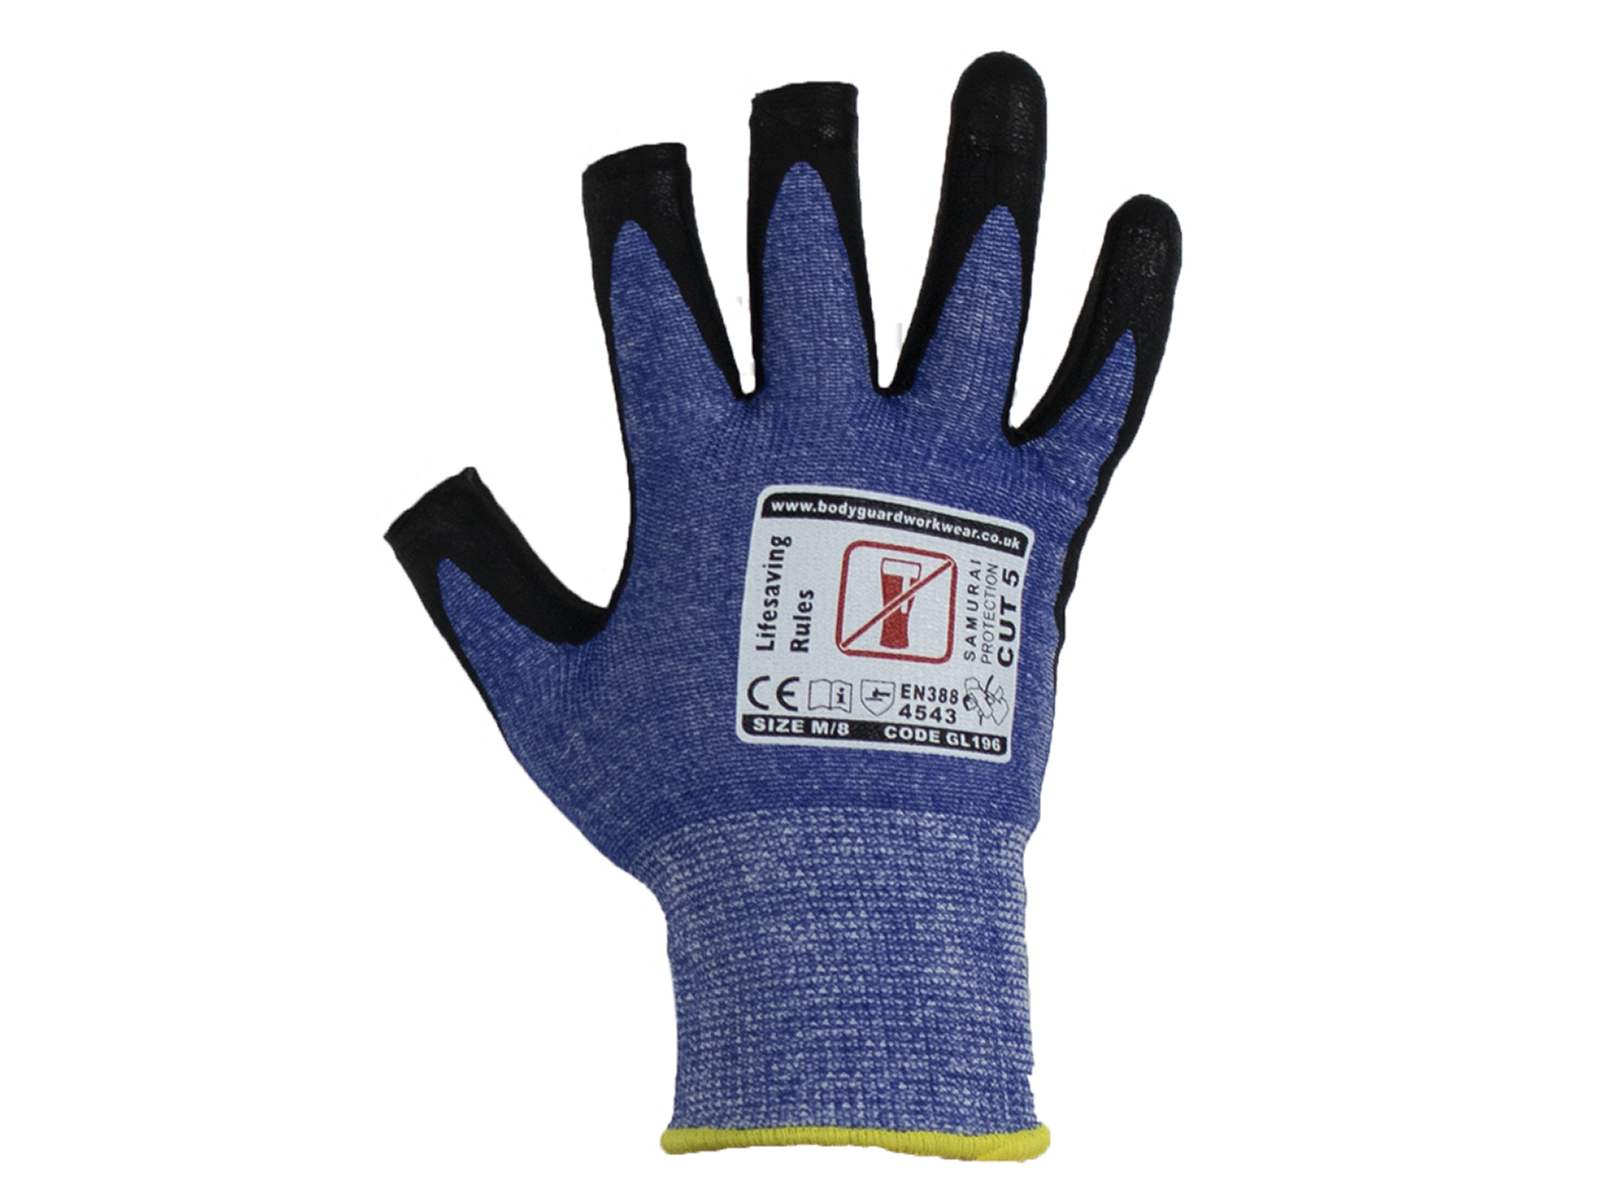 3 Digit Samurai Lite Cut 5 Safety Glove w/ fingertip contact- Multipack